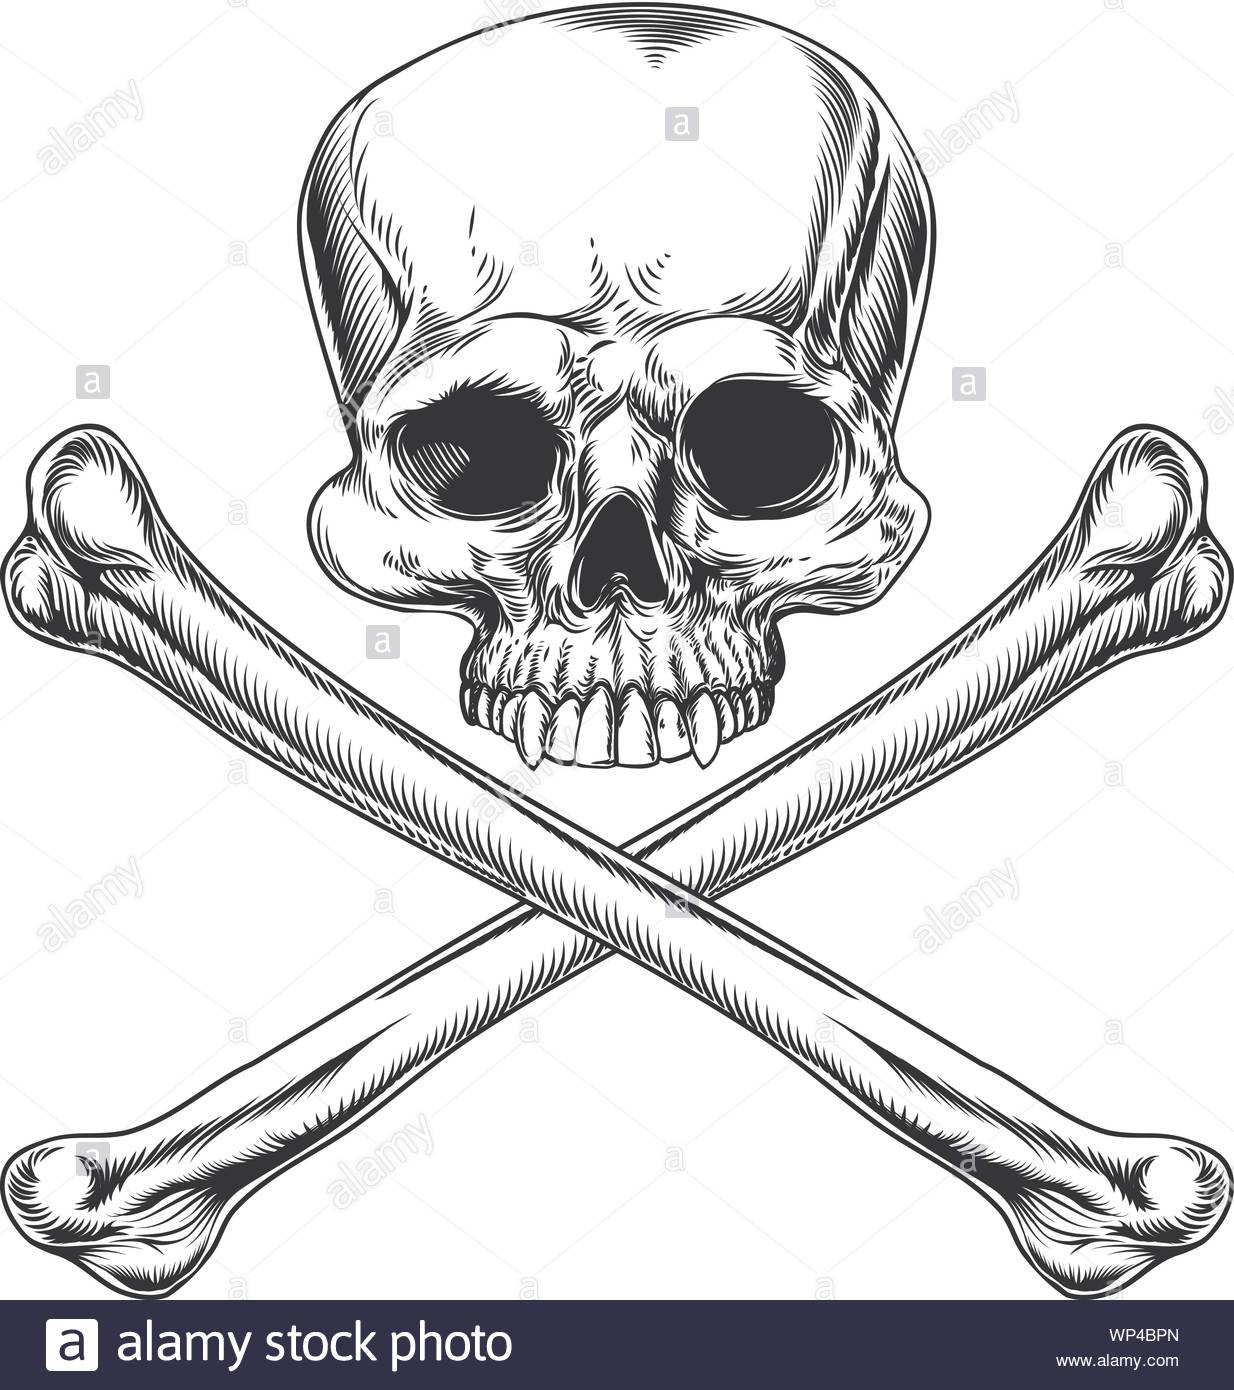 Logo Métal Crâne squelette emblème badge emblem tete de mort skull 95mm x 85mm